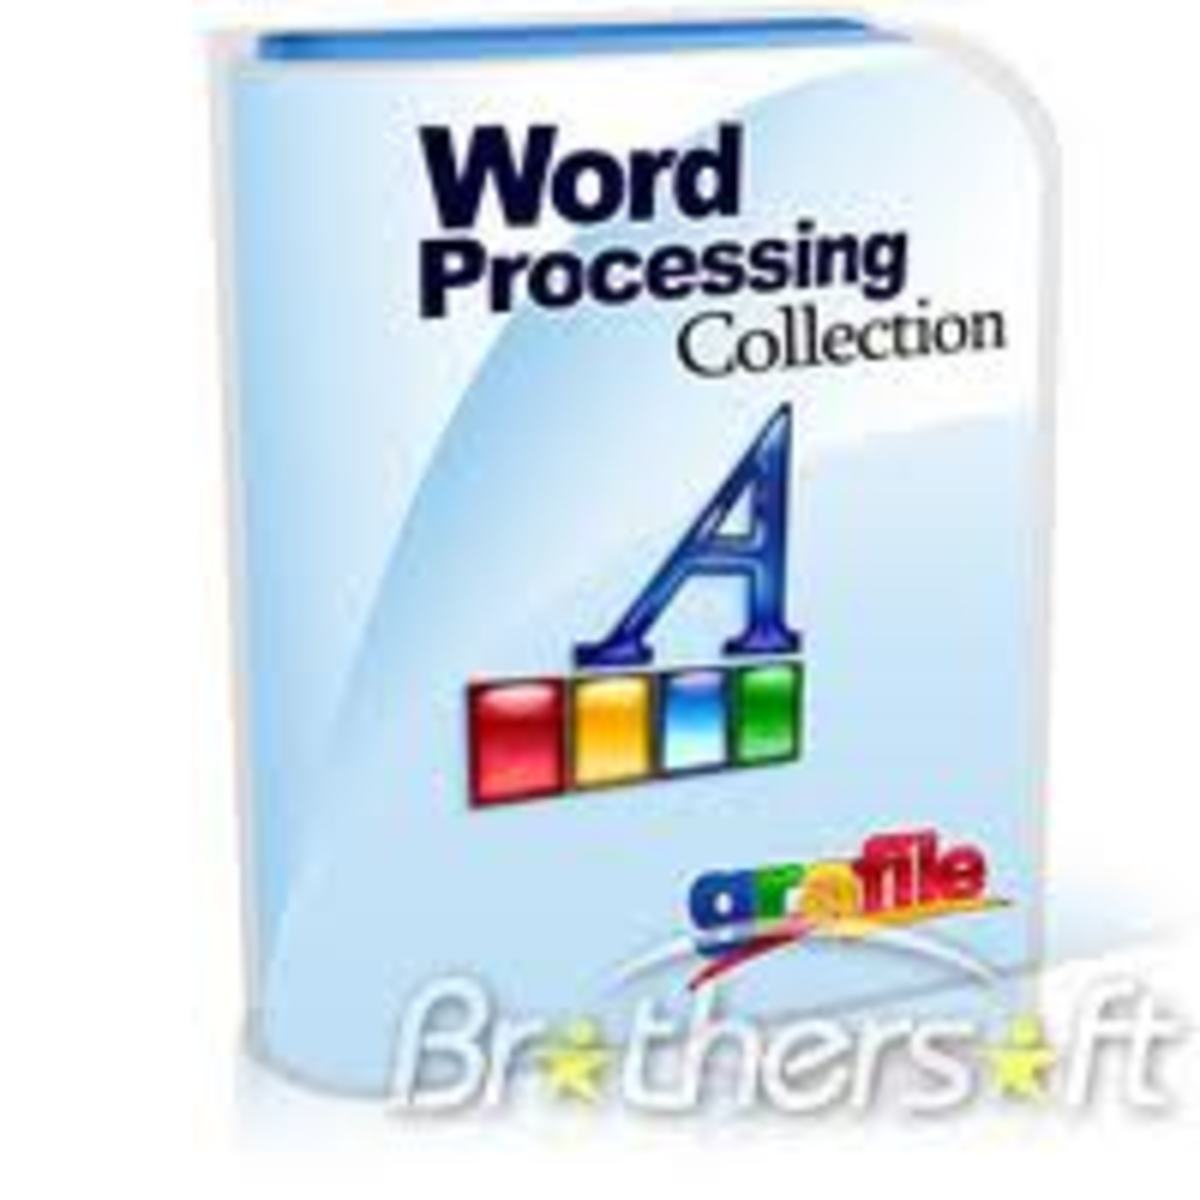 Word processor problems please help!?